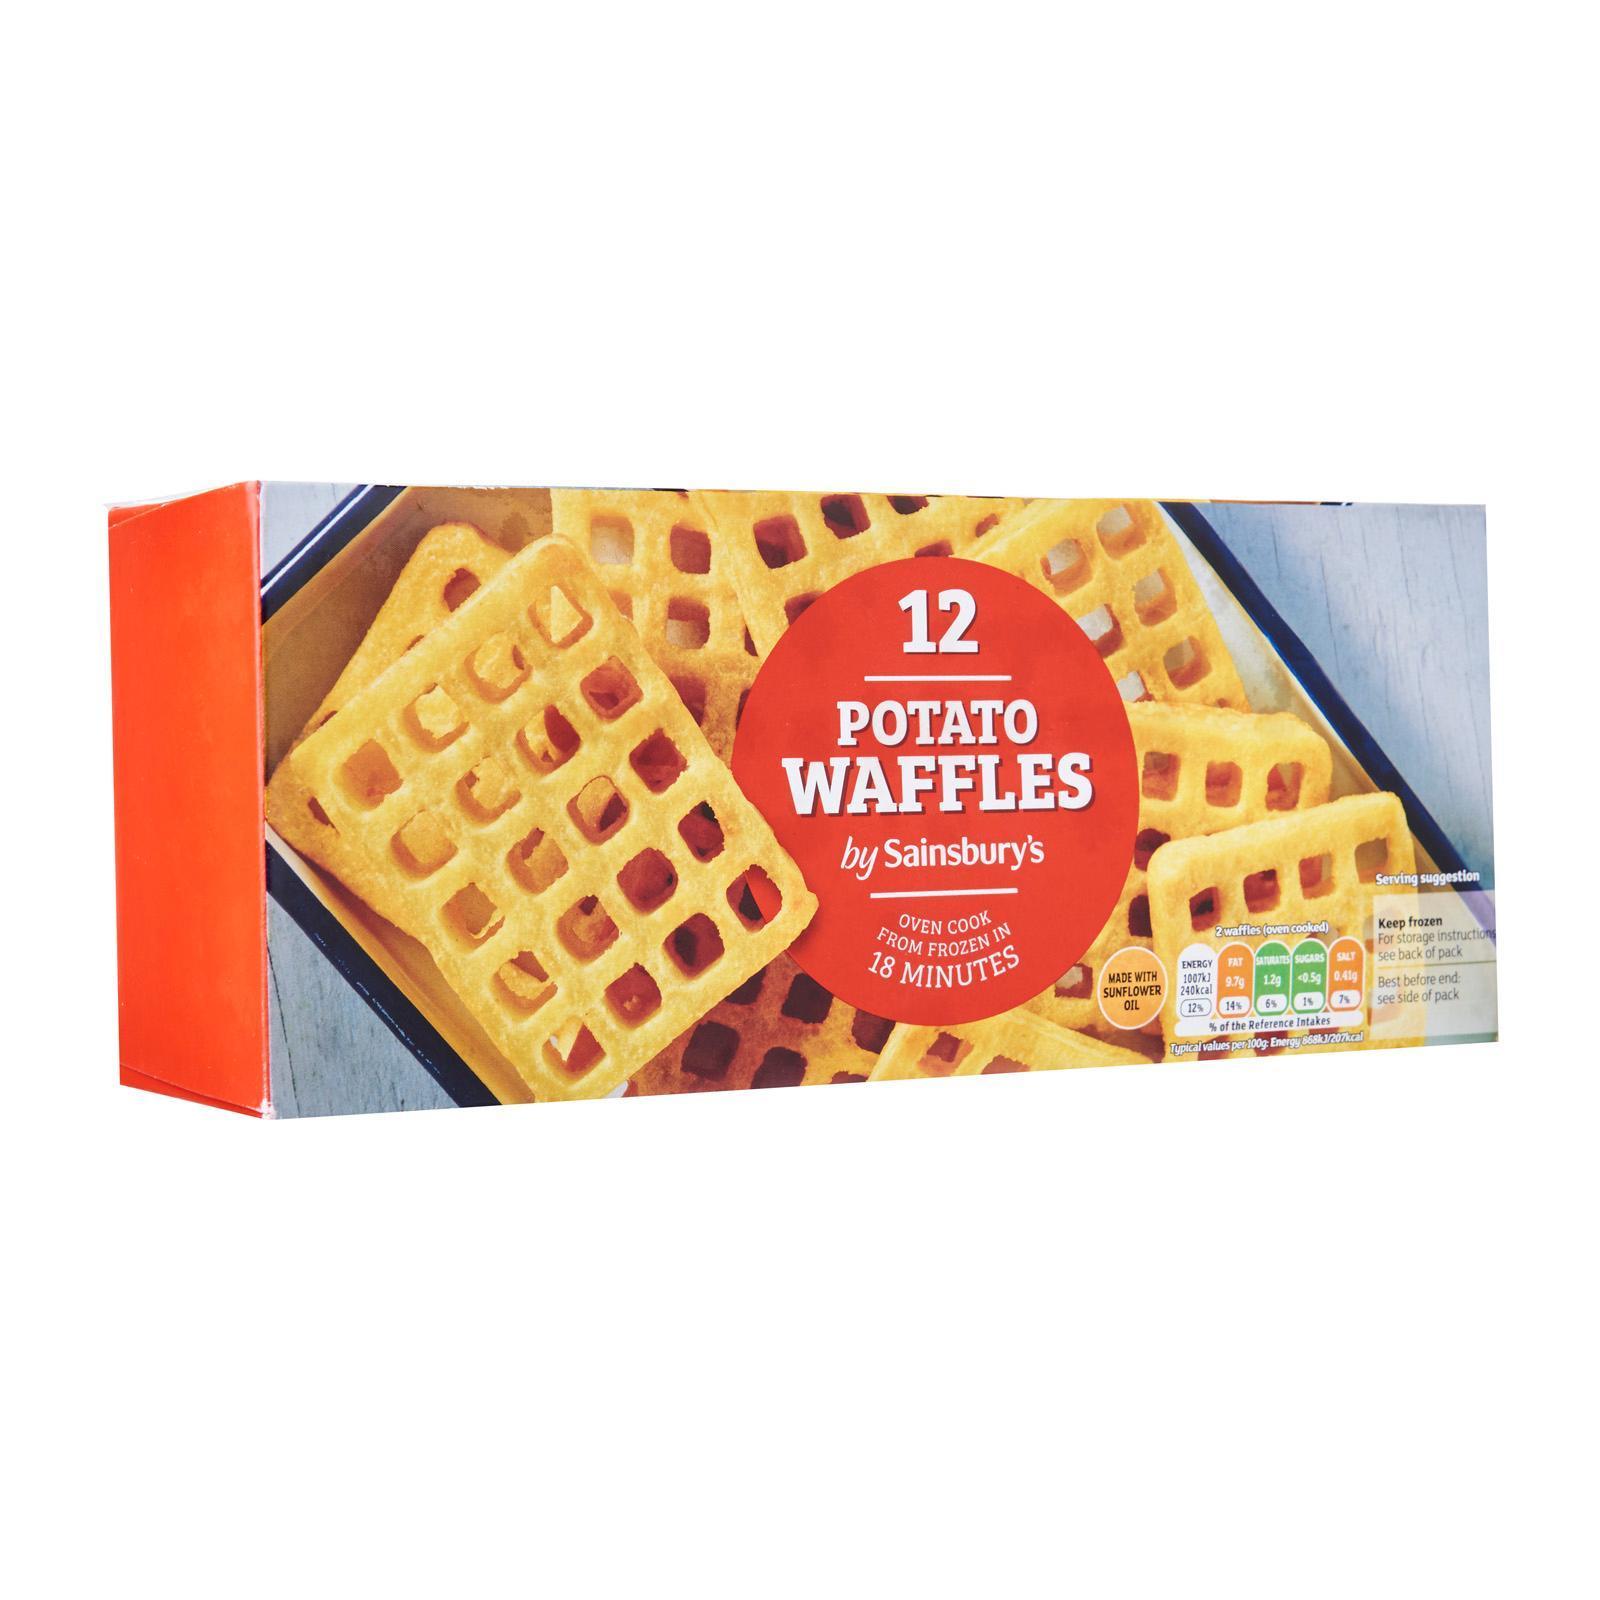 Sainsbury's Potato Waffles - Frozen